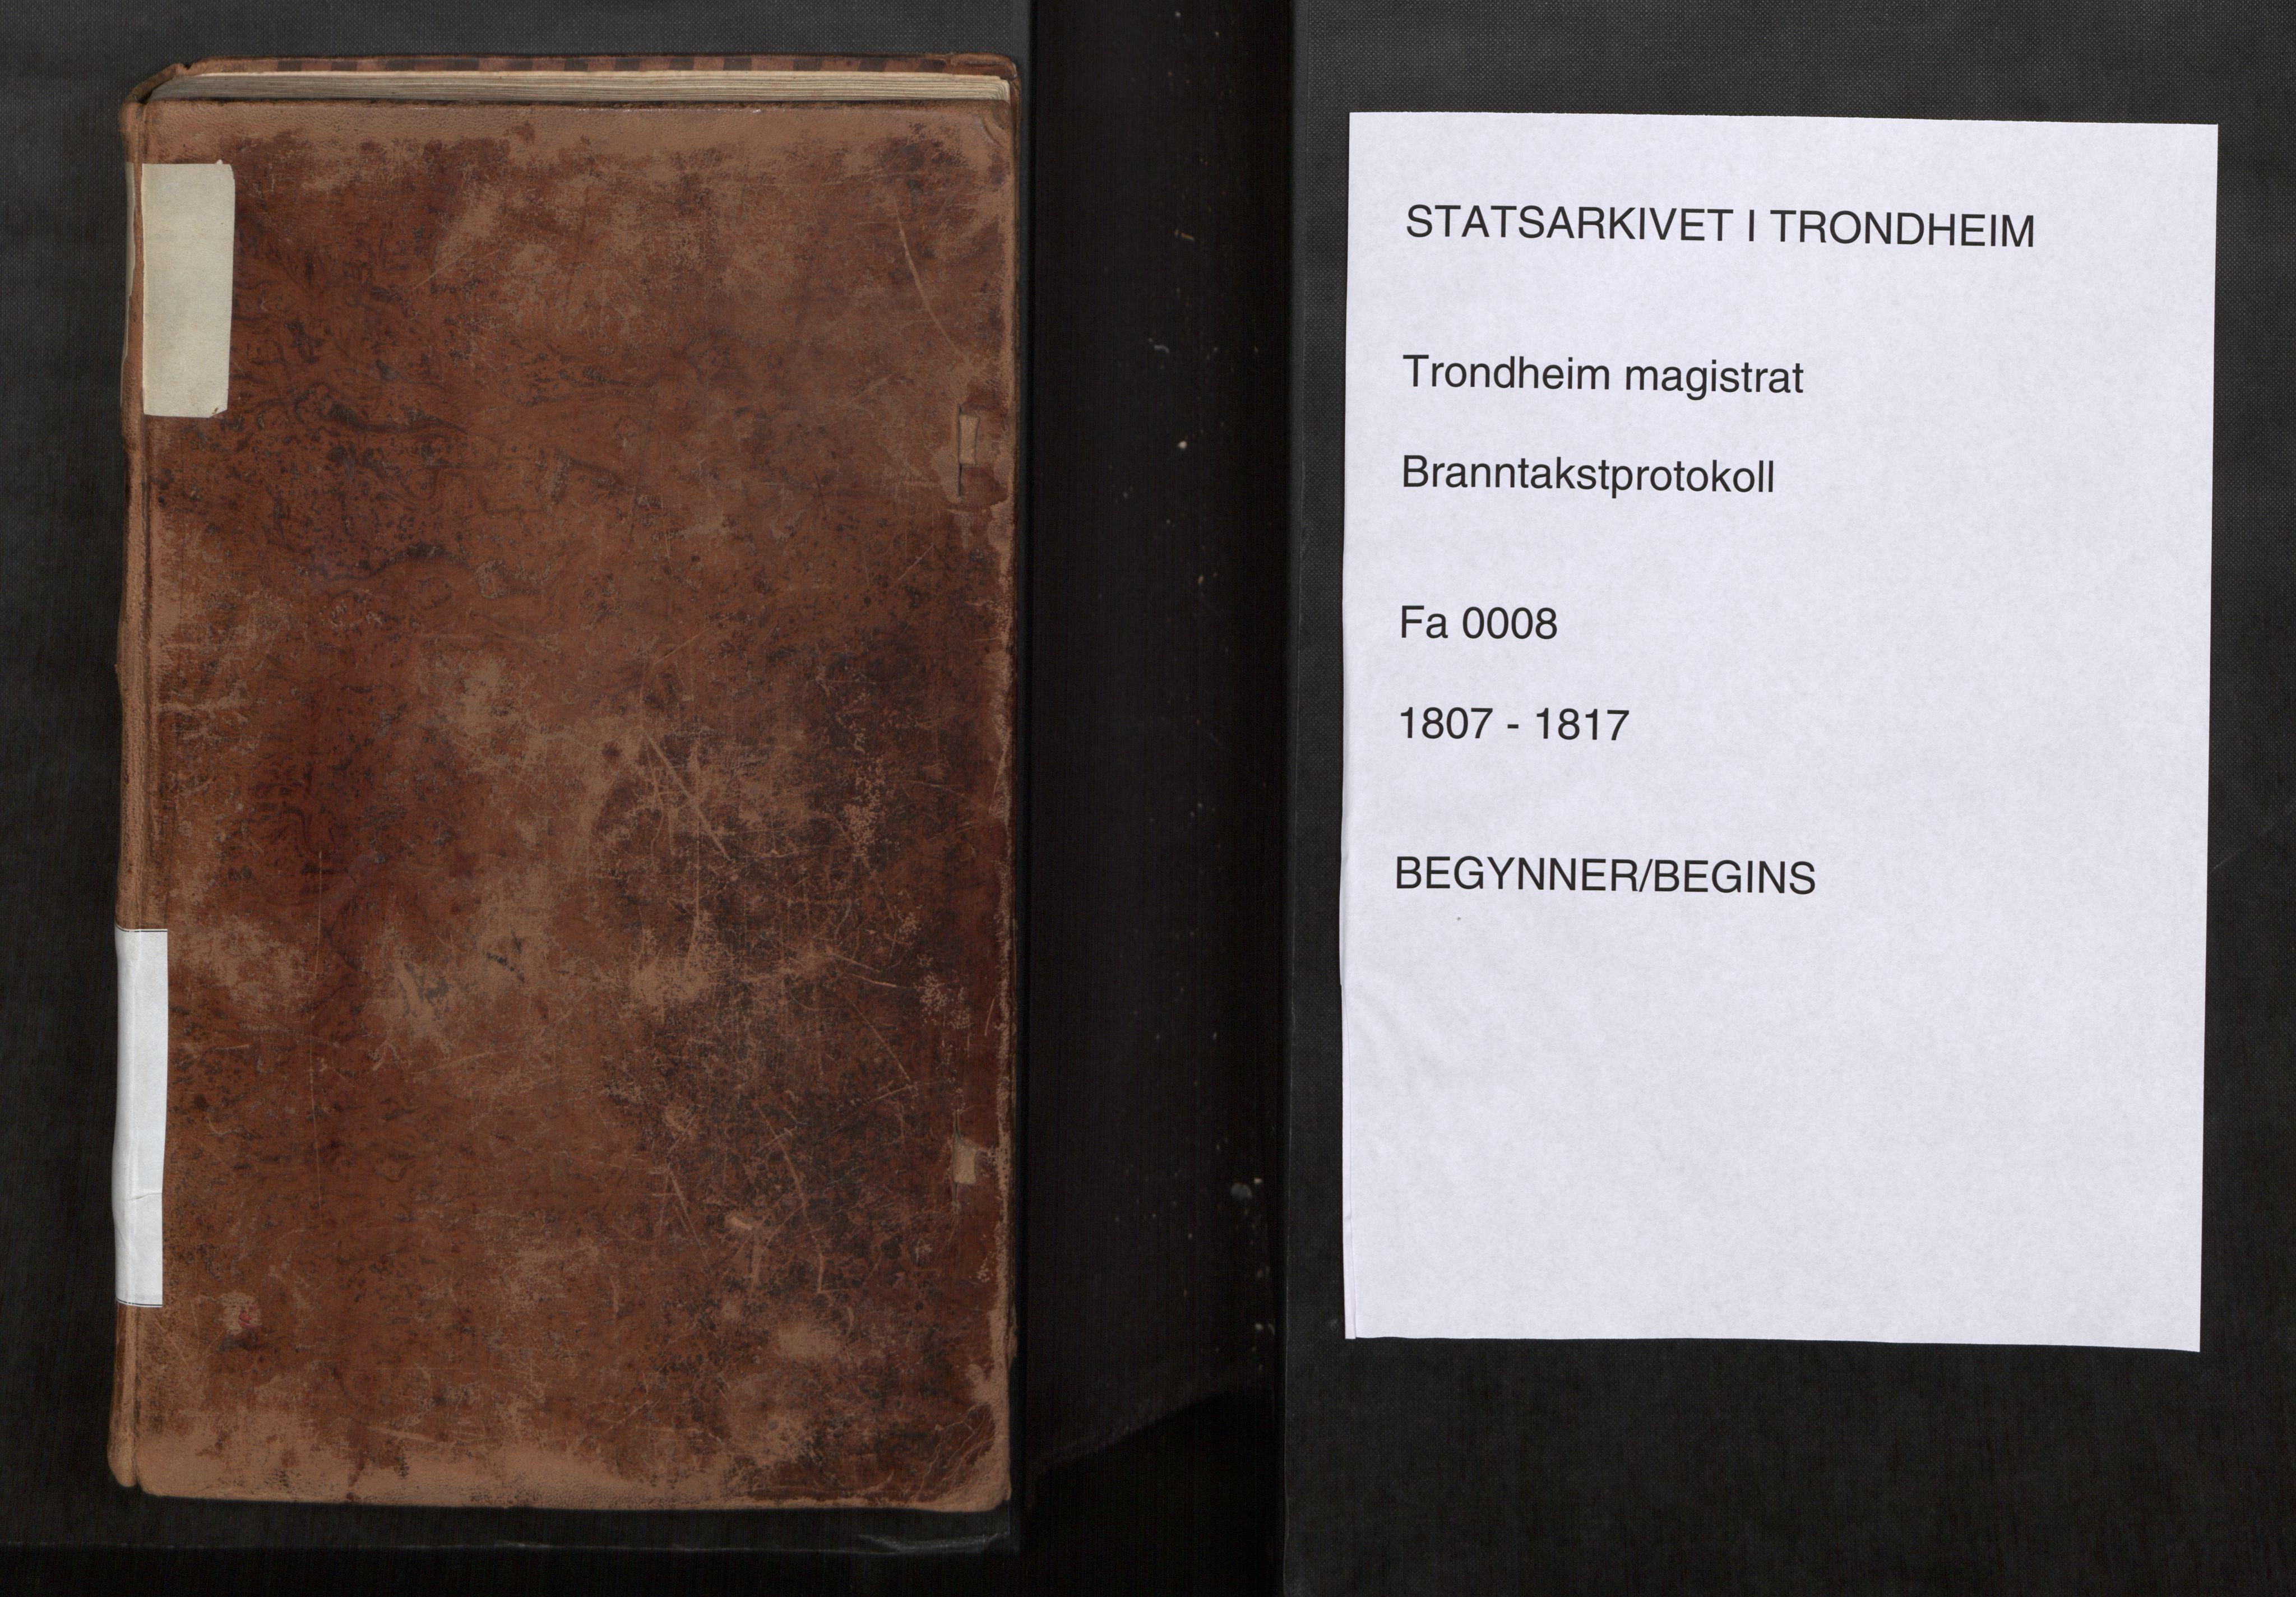 SAT, Norges Brannkasse Trondheim magistrat, Fa/L0015: Branntakstprotokoll K17, 1807-1817